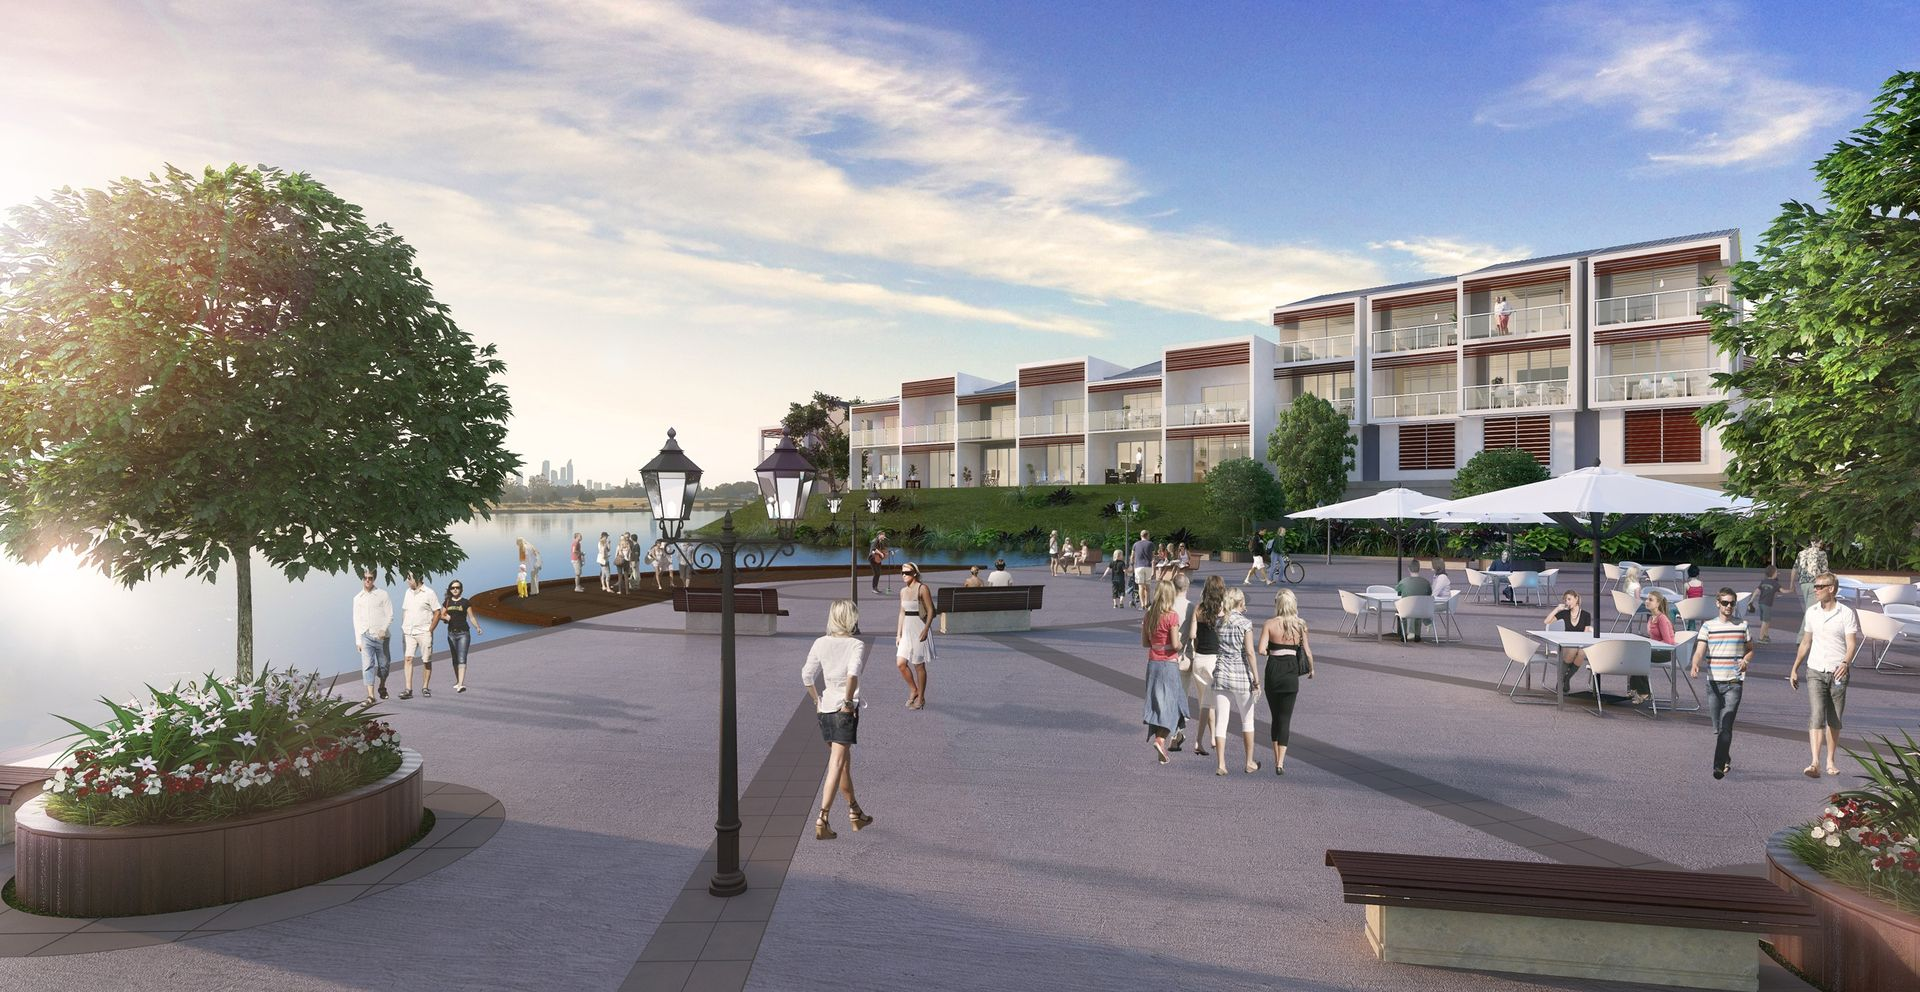 6063/3028 The Boulevard, Emerald Lakes, Carrara QLD 4211, Image 1